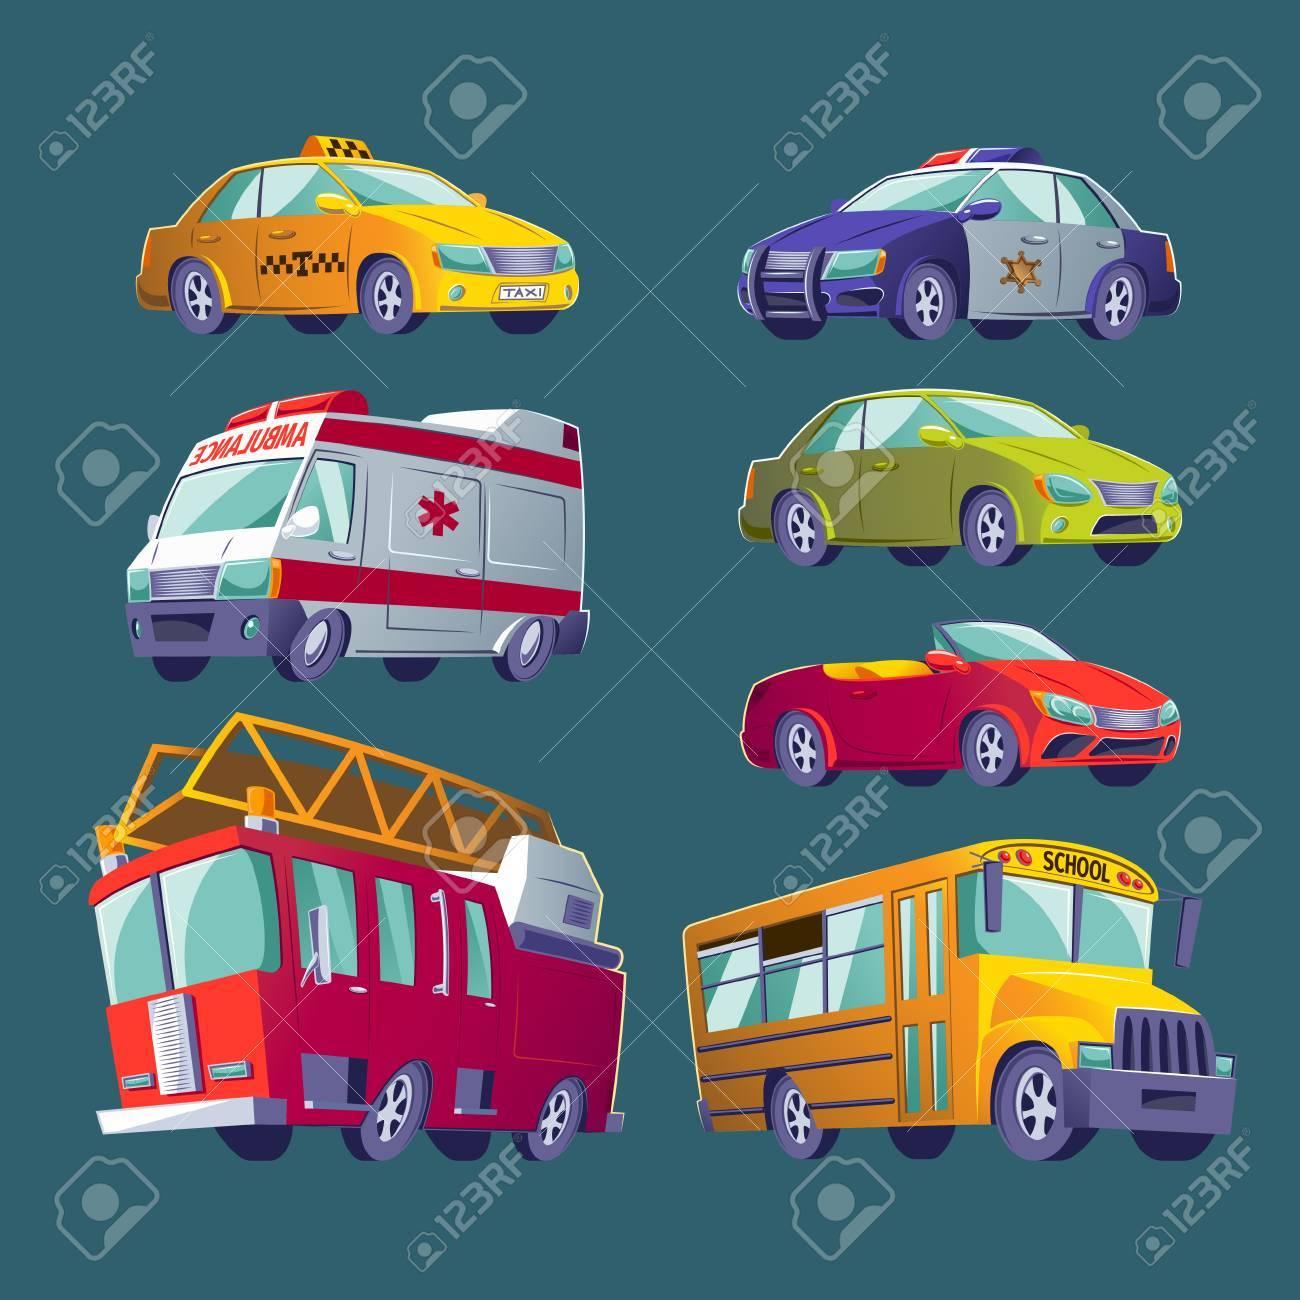 Jeu De Dessin Anime D Icones Isolees Du Transport Urbain Camion